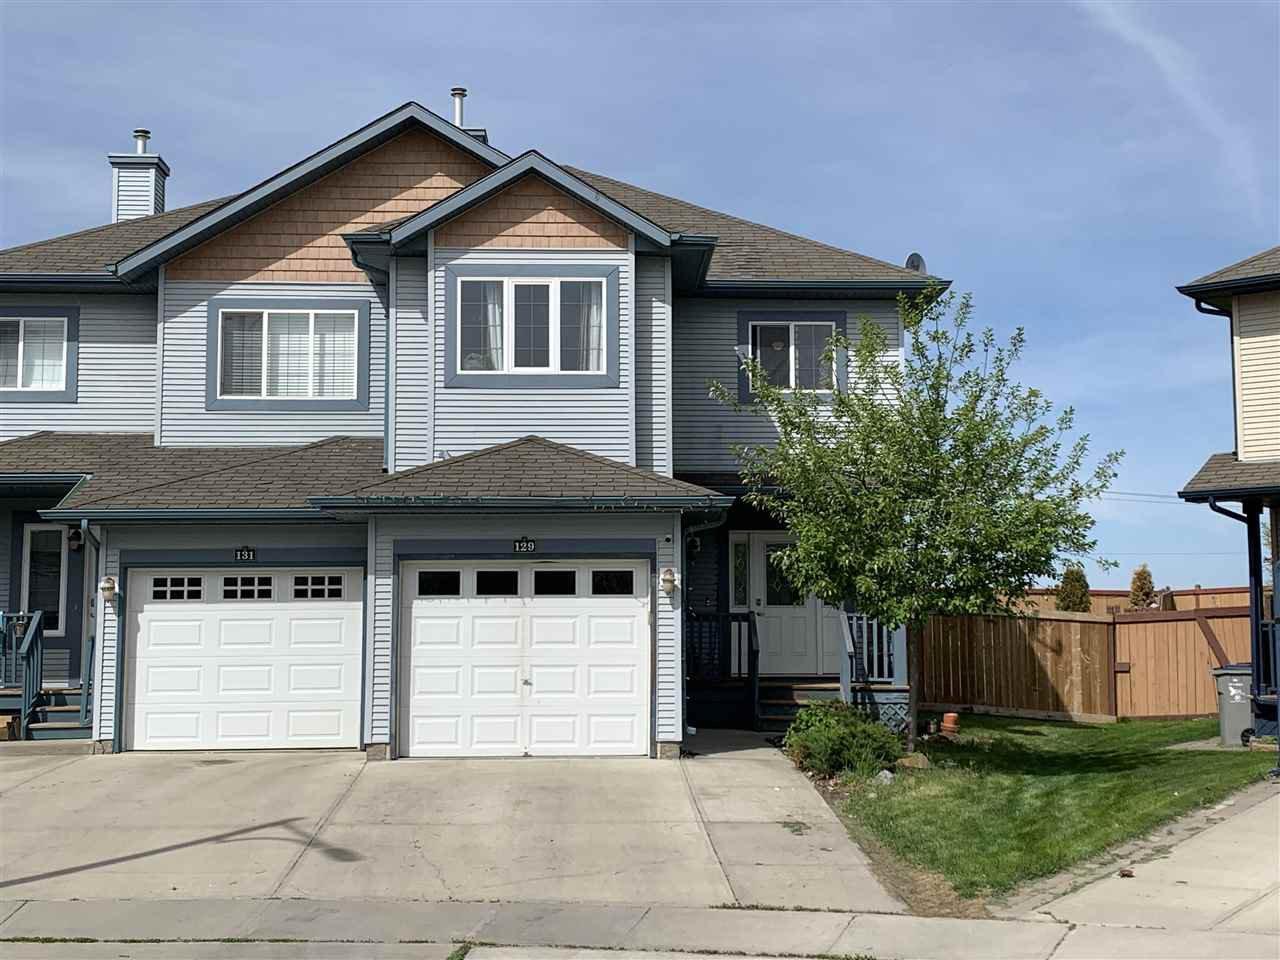 Main Photo: 129 RUE MAGNAN: Beaumont House Half Duplex for sale : MLS®# E4200631